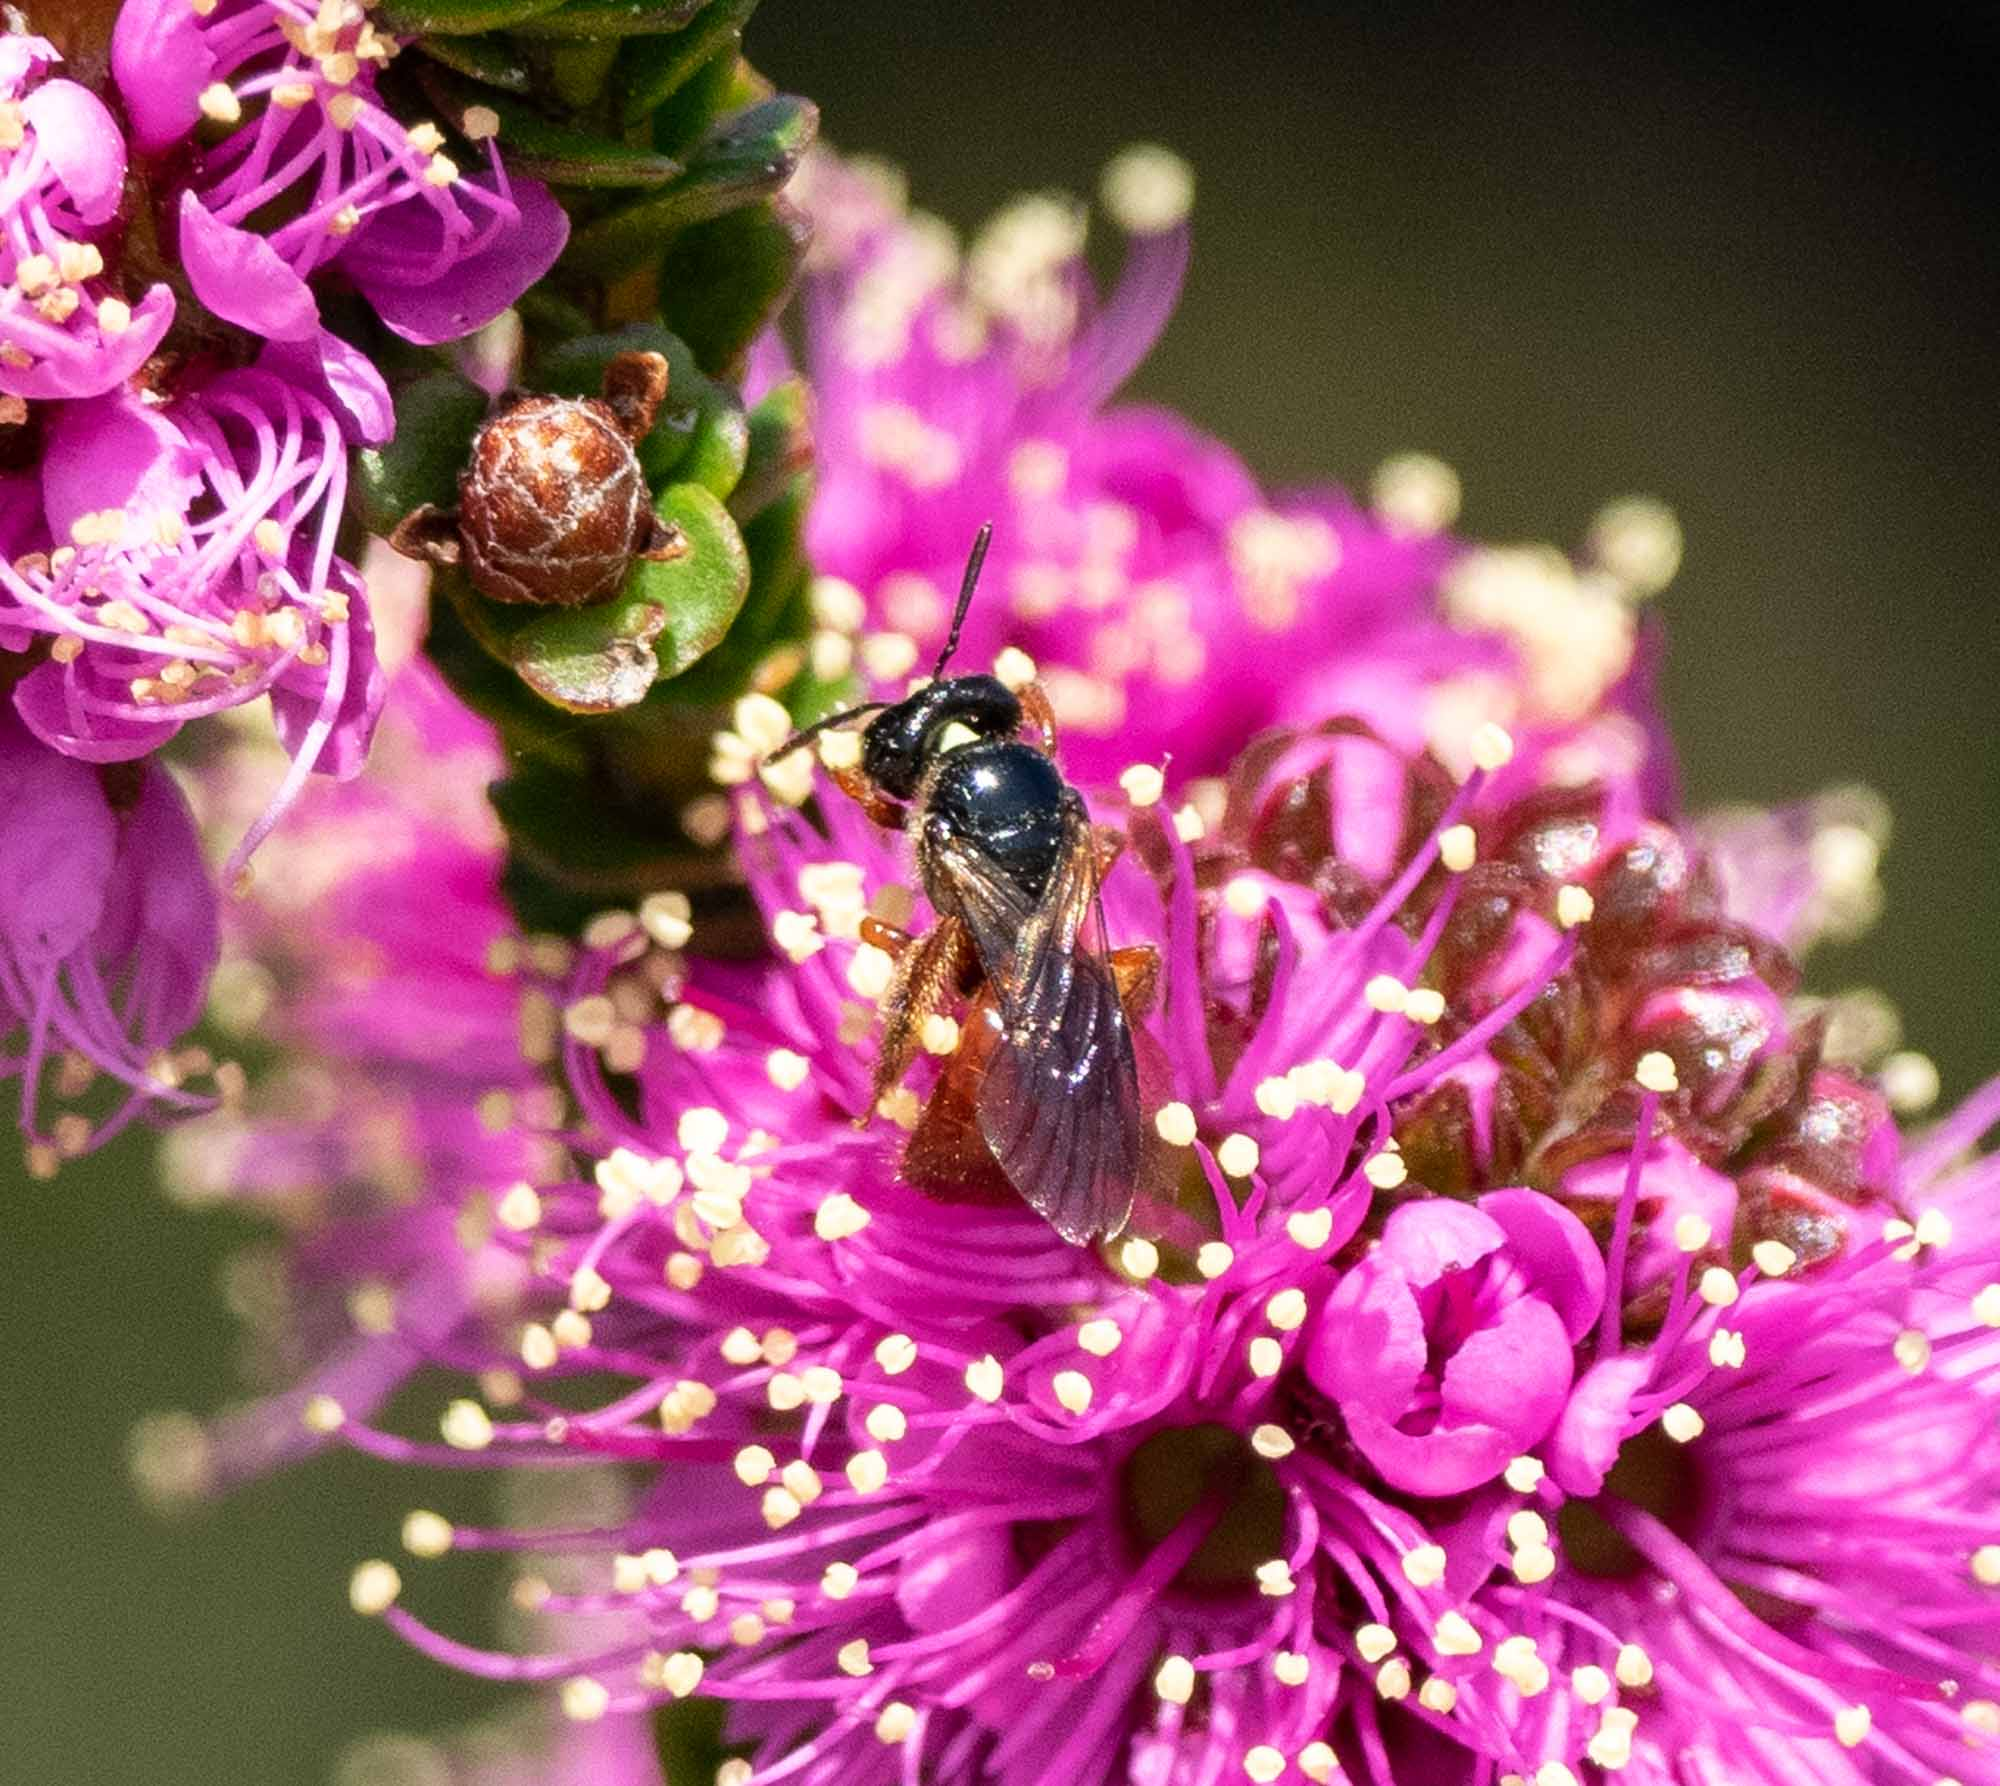 Exoneura (native bee) on Beaufortia micrantha (Little Bottlebrush)